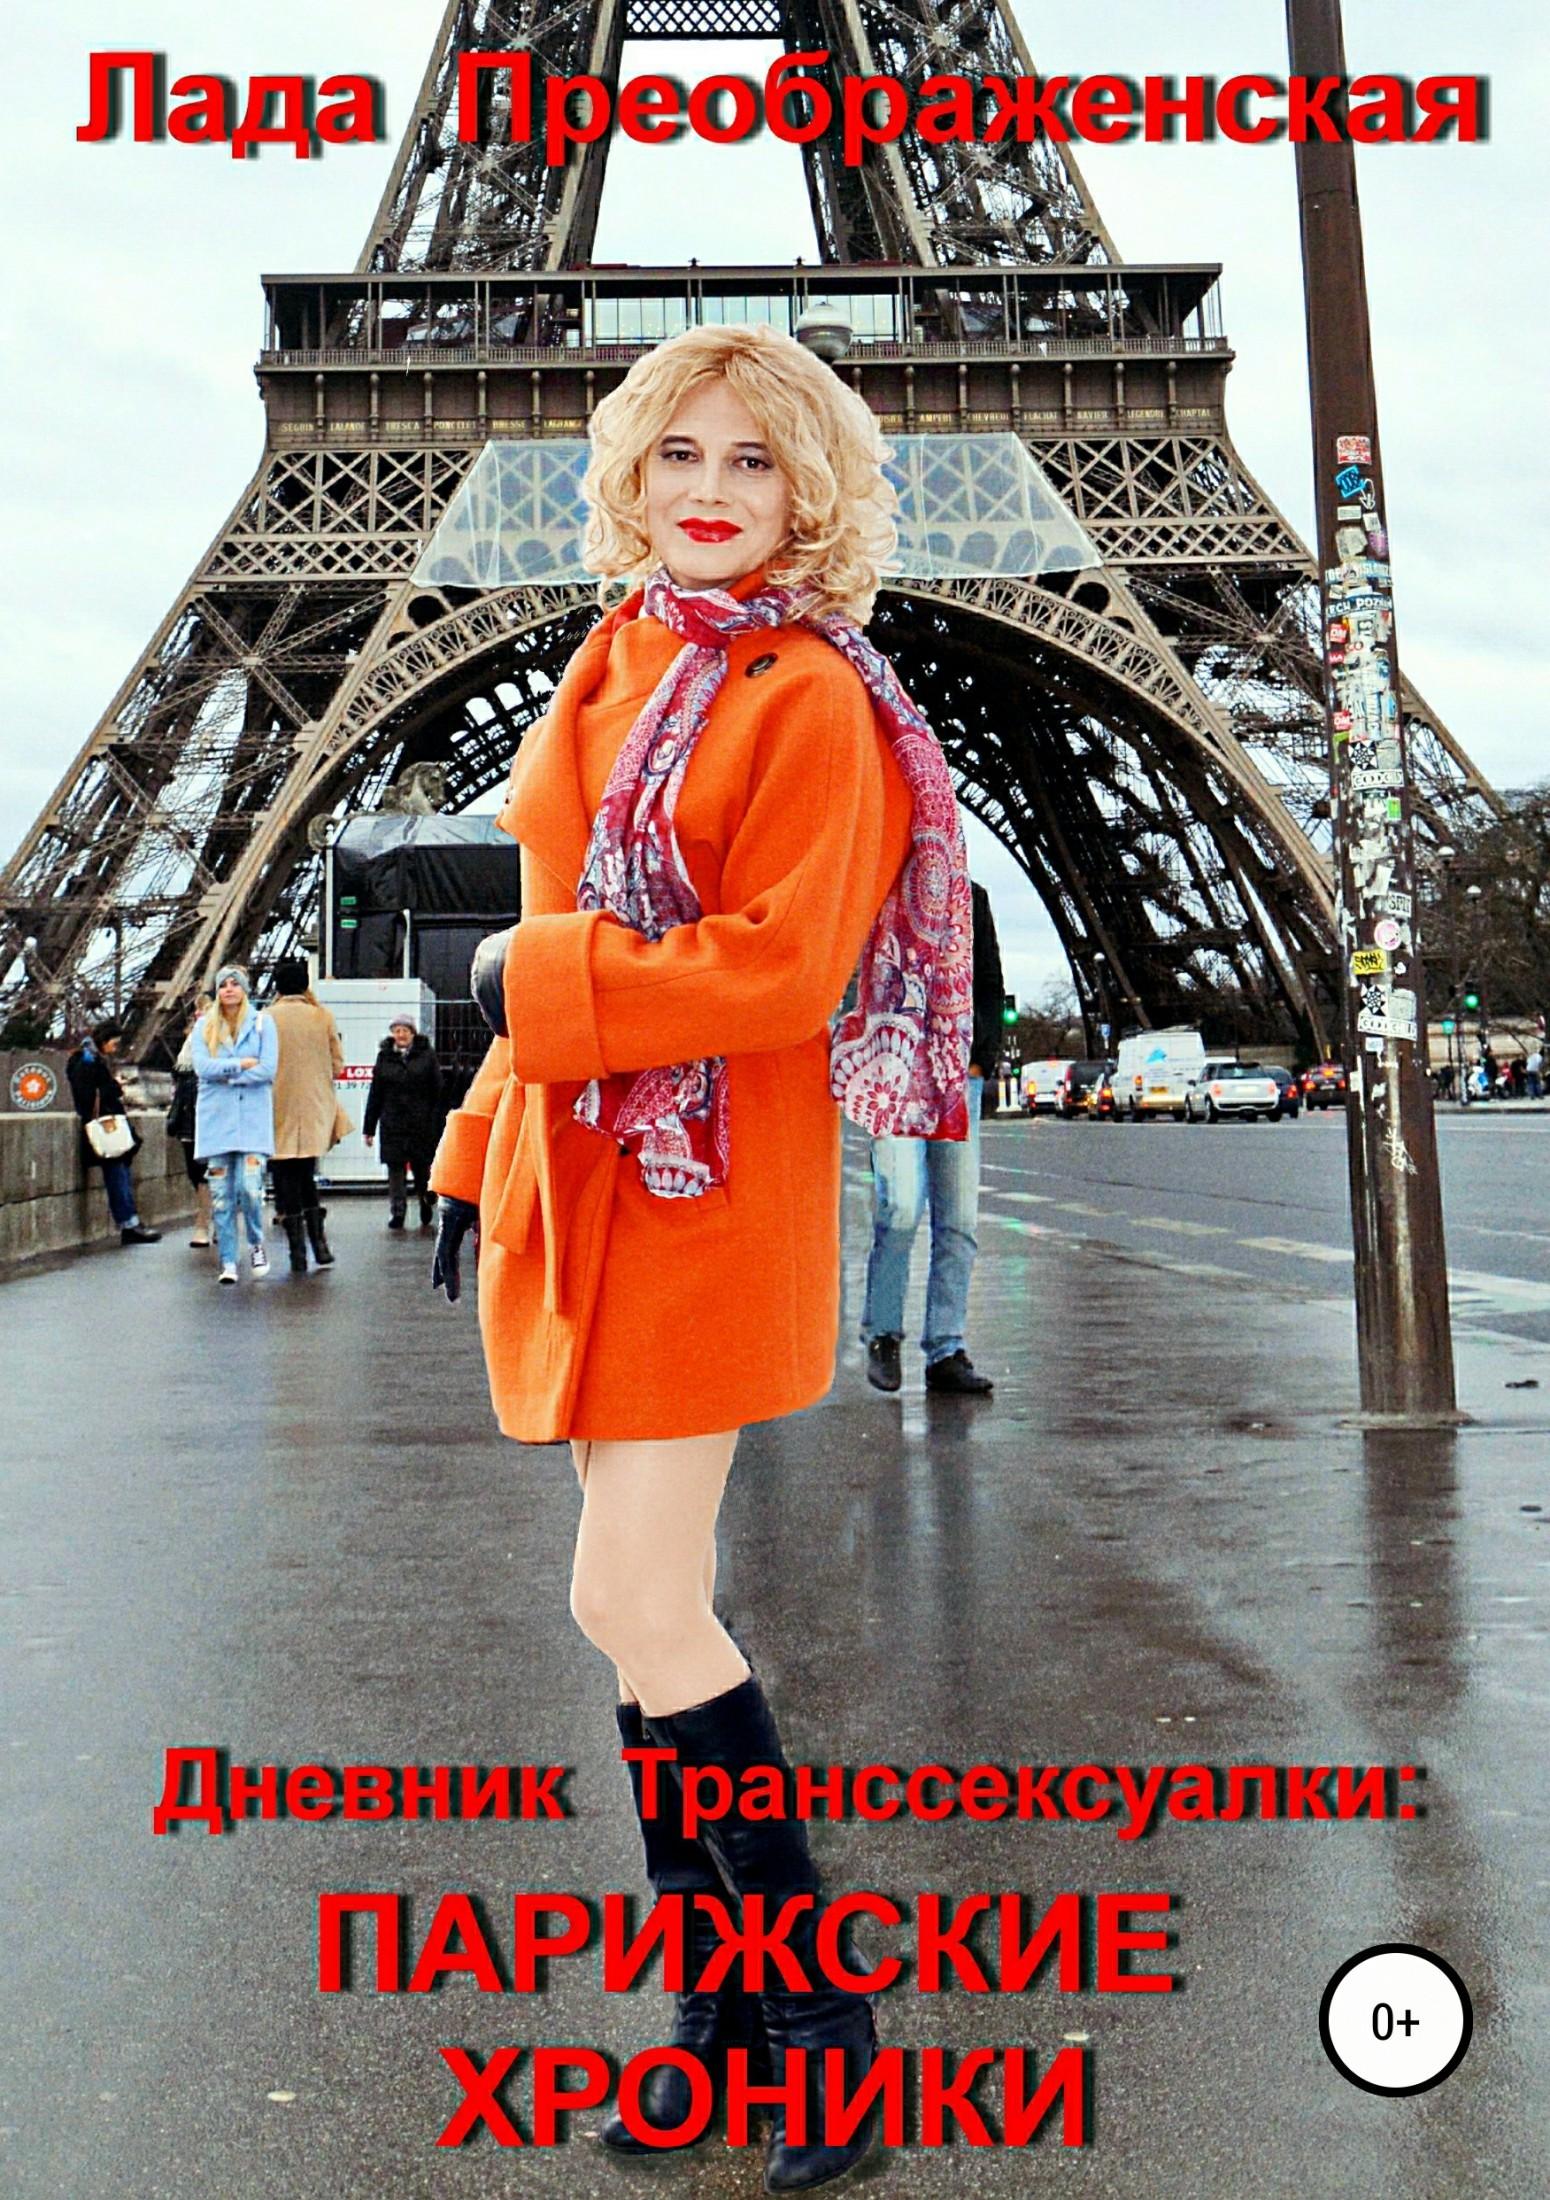 Лада Алексеевна Преображенская. Дневник Транссексуалки: Парижские хроники